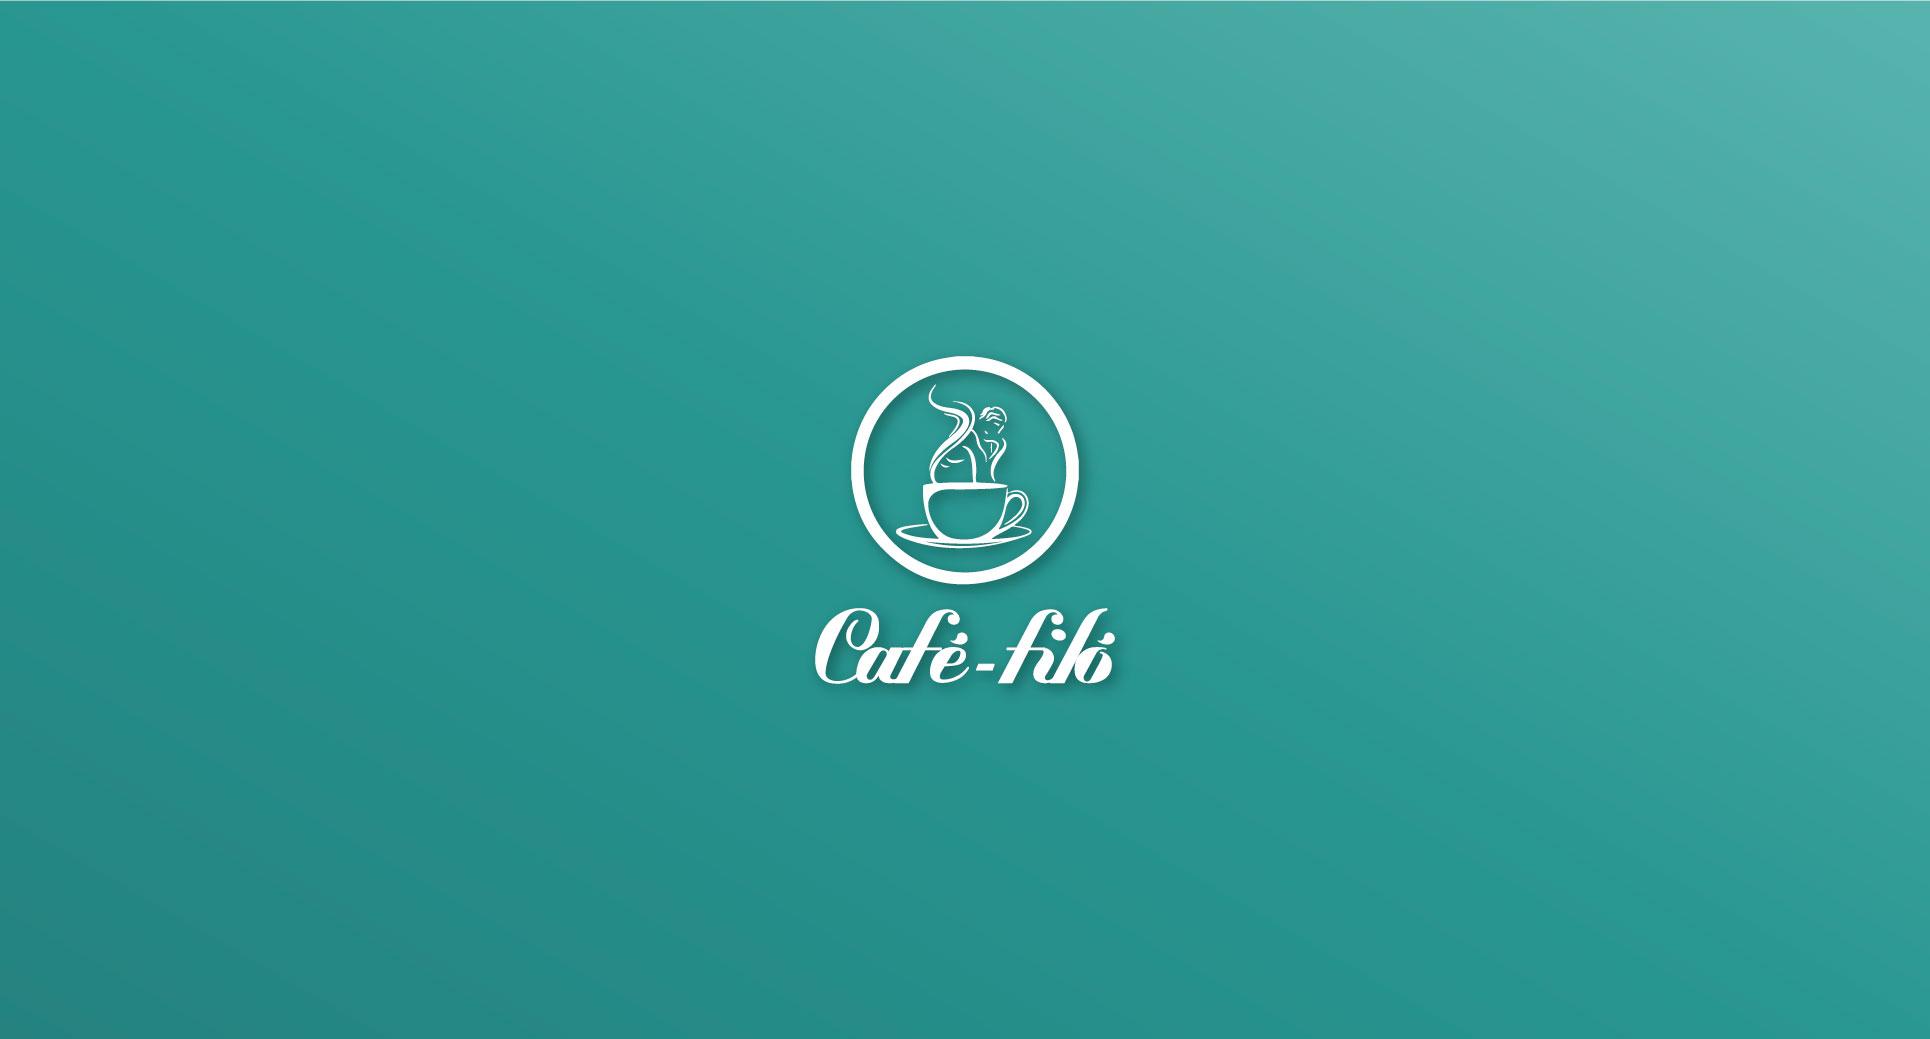 Café Filo grande